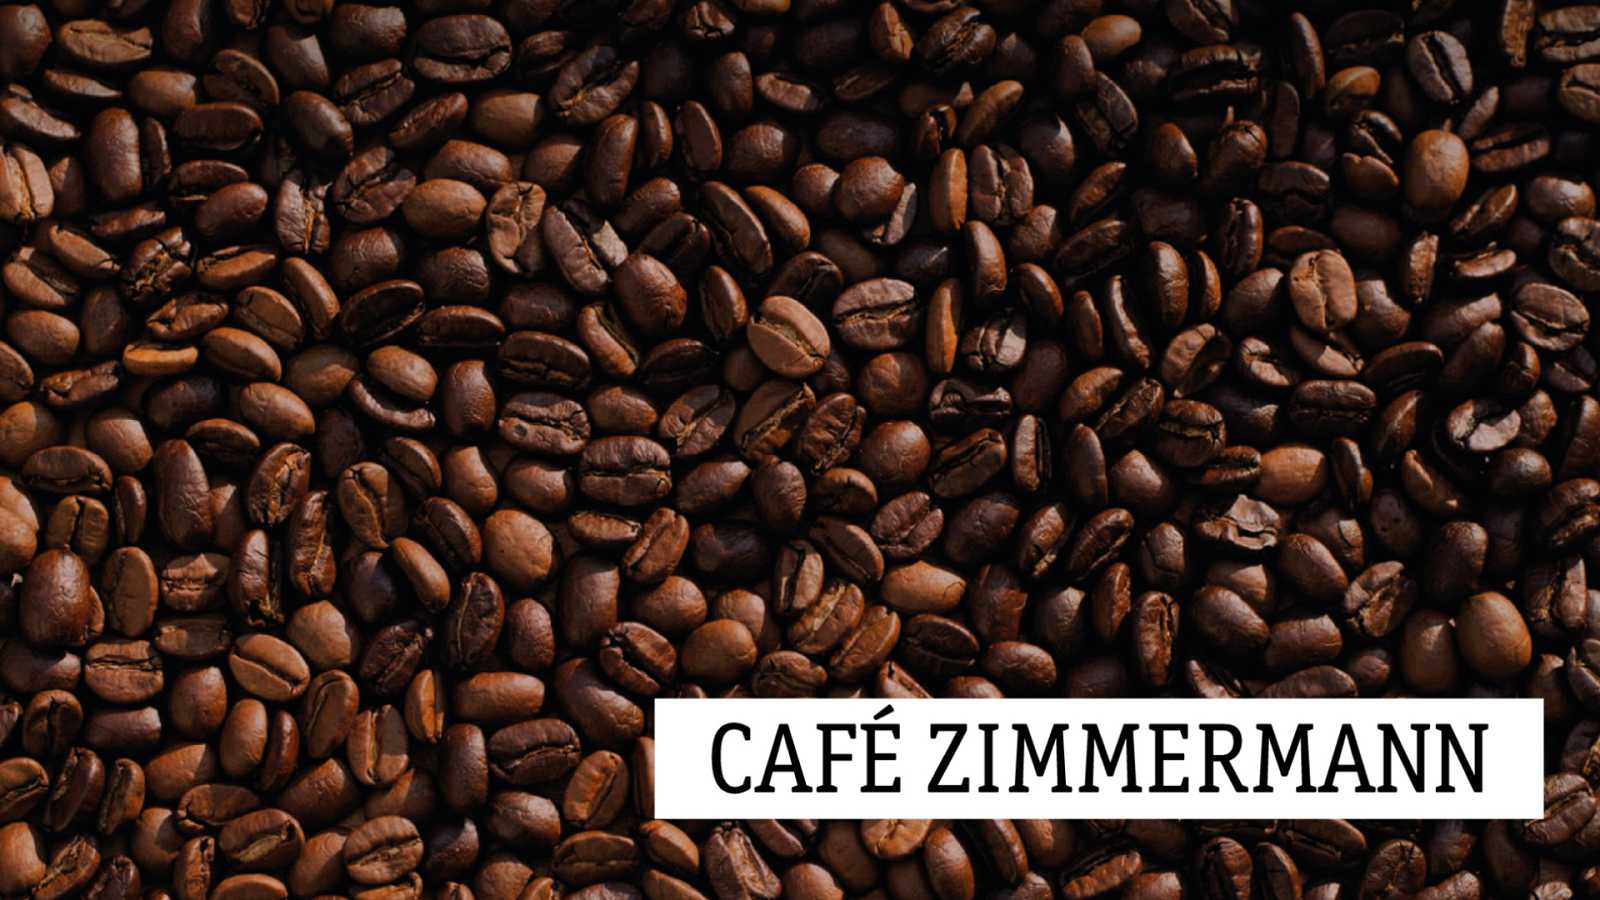 Café Zimmermann - Gorka Hermosa - 14/05/21 - escuchar ahora